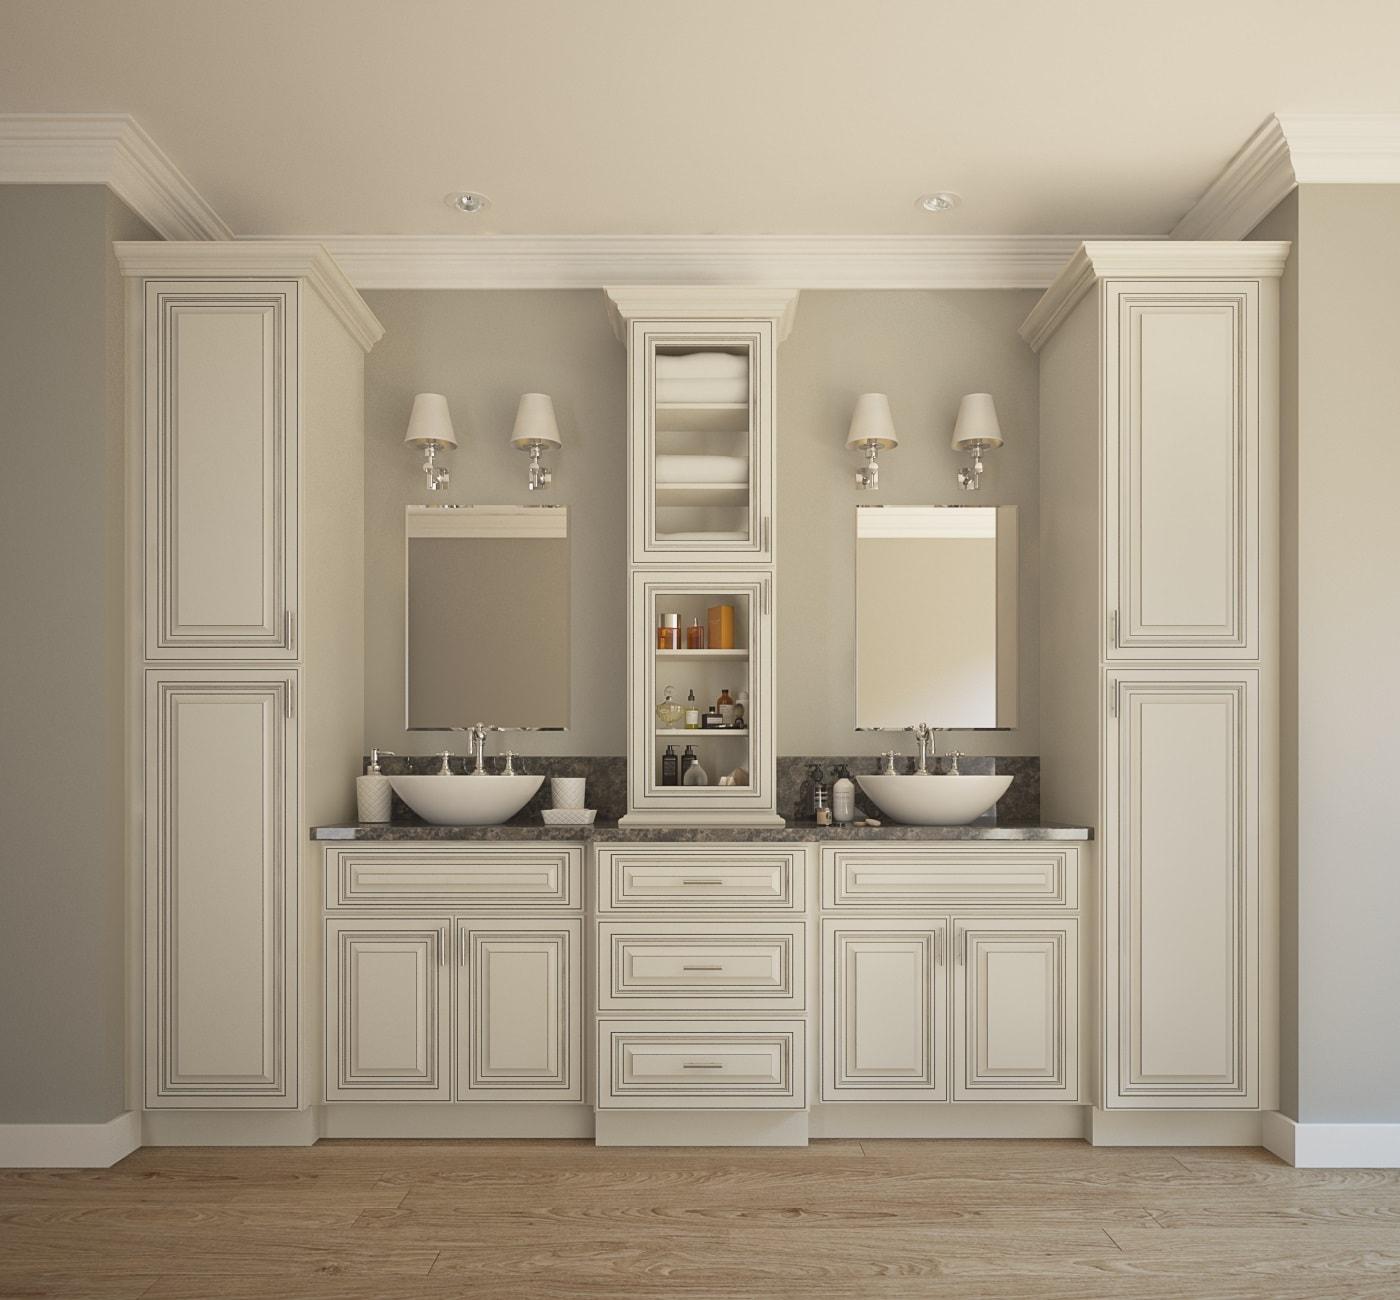 Bathroom Storage Cabinet Large Smart Ideas For Bathroom inside dimensions 1400 X 1300